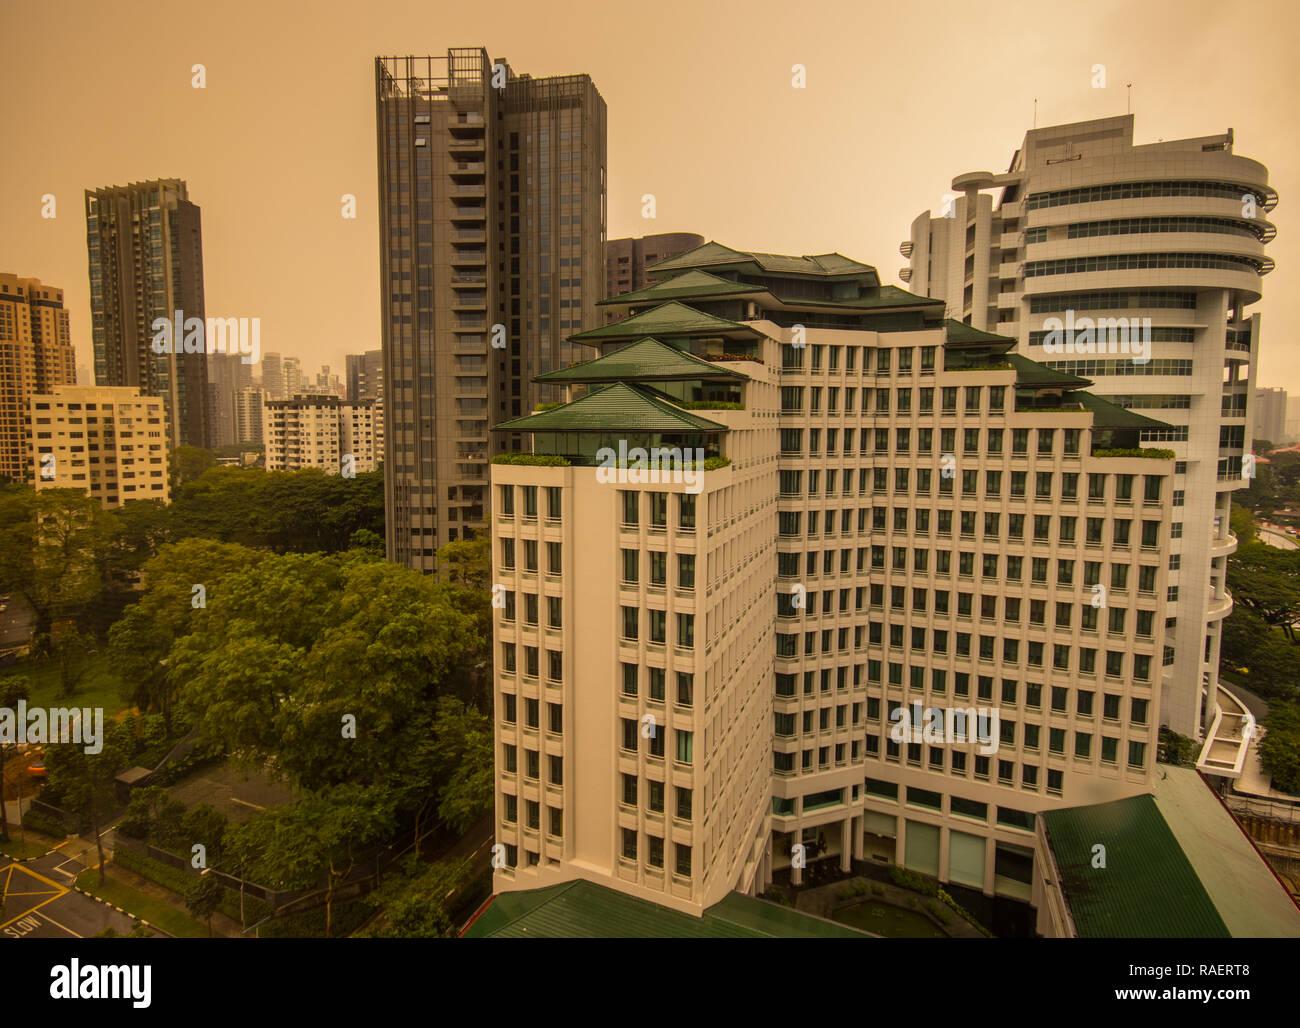 Singapore Tourism Board, Orchard, Singapore - Stock Image